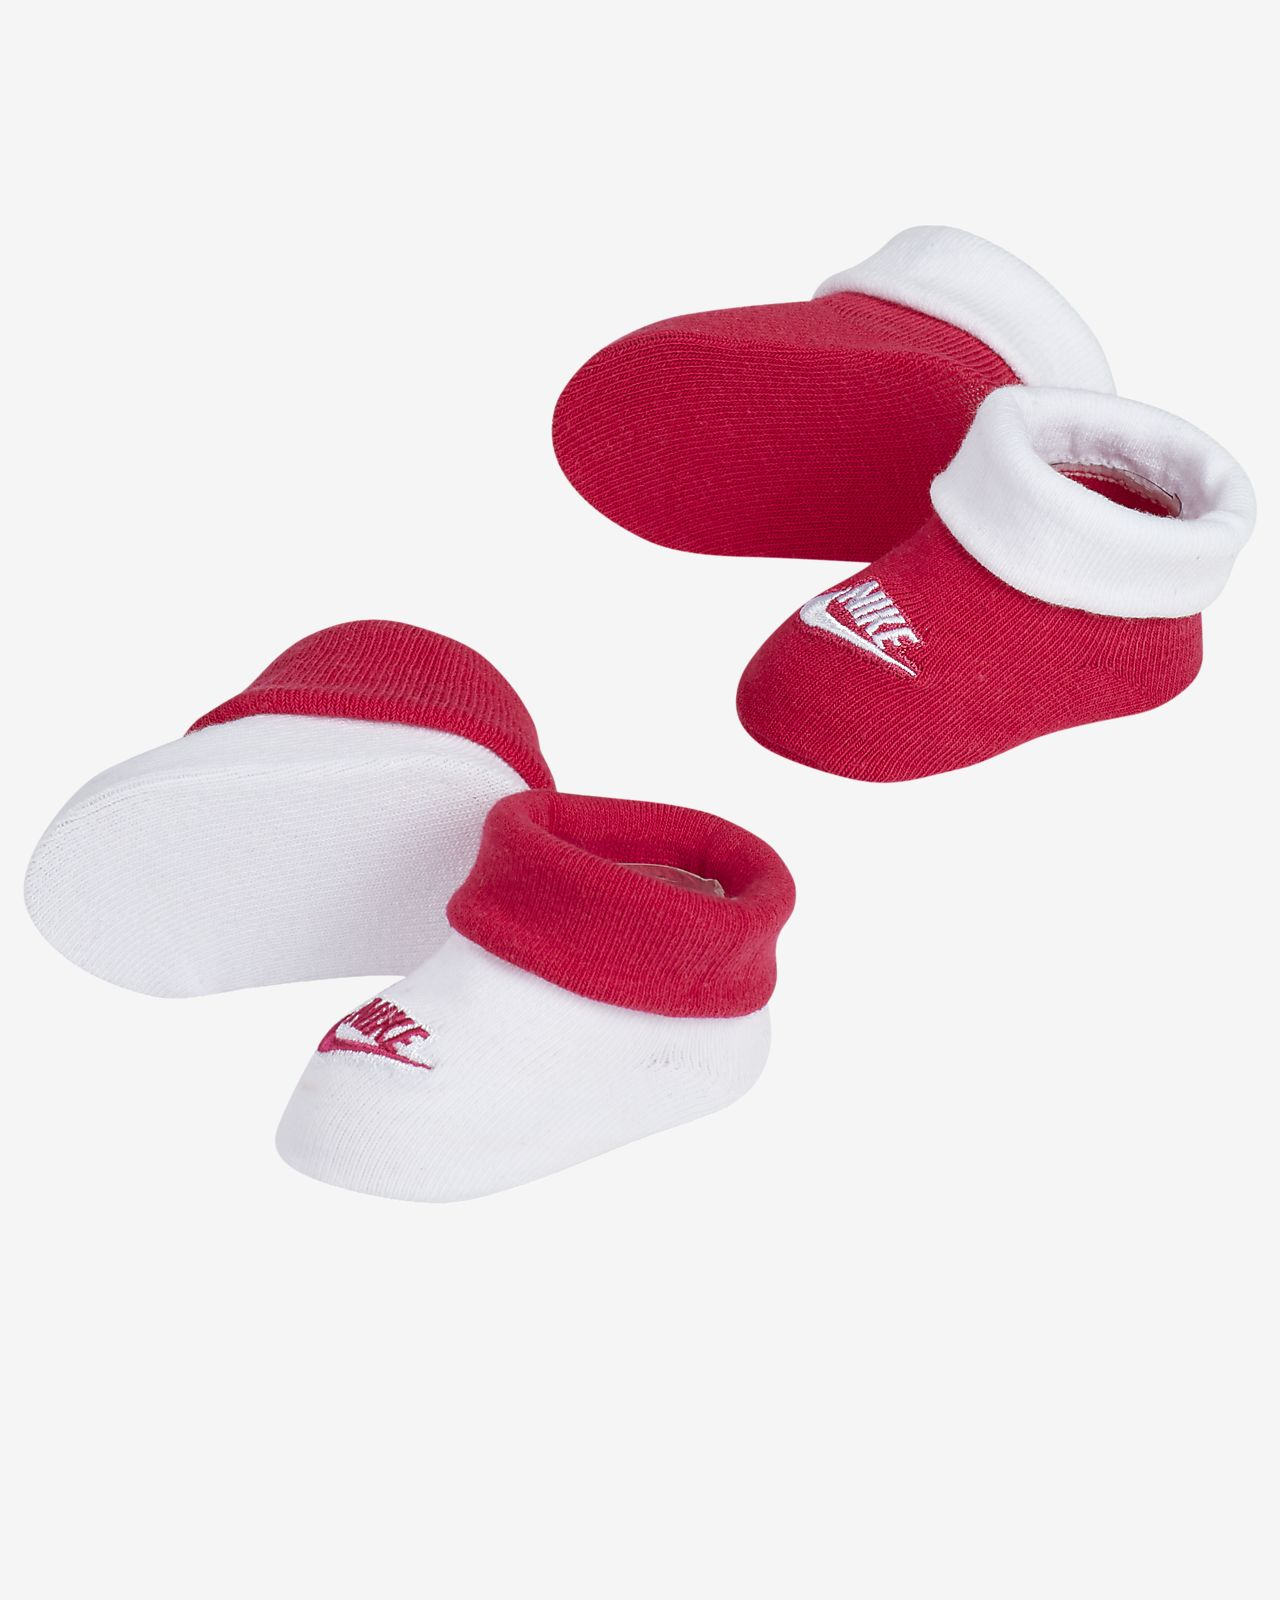 Nike Baby Booties Set (2 Pairs)